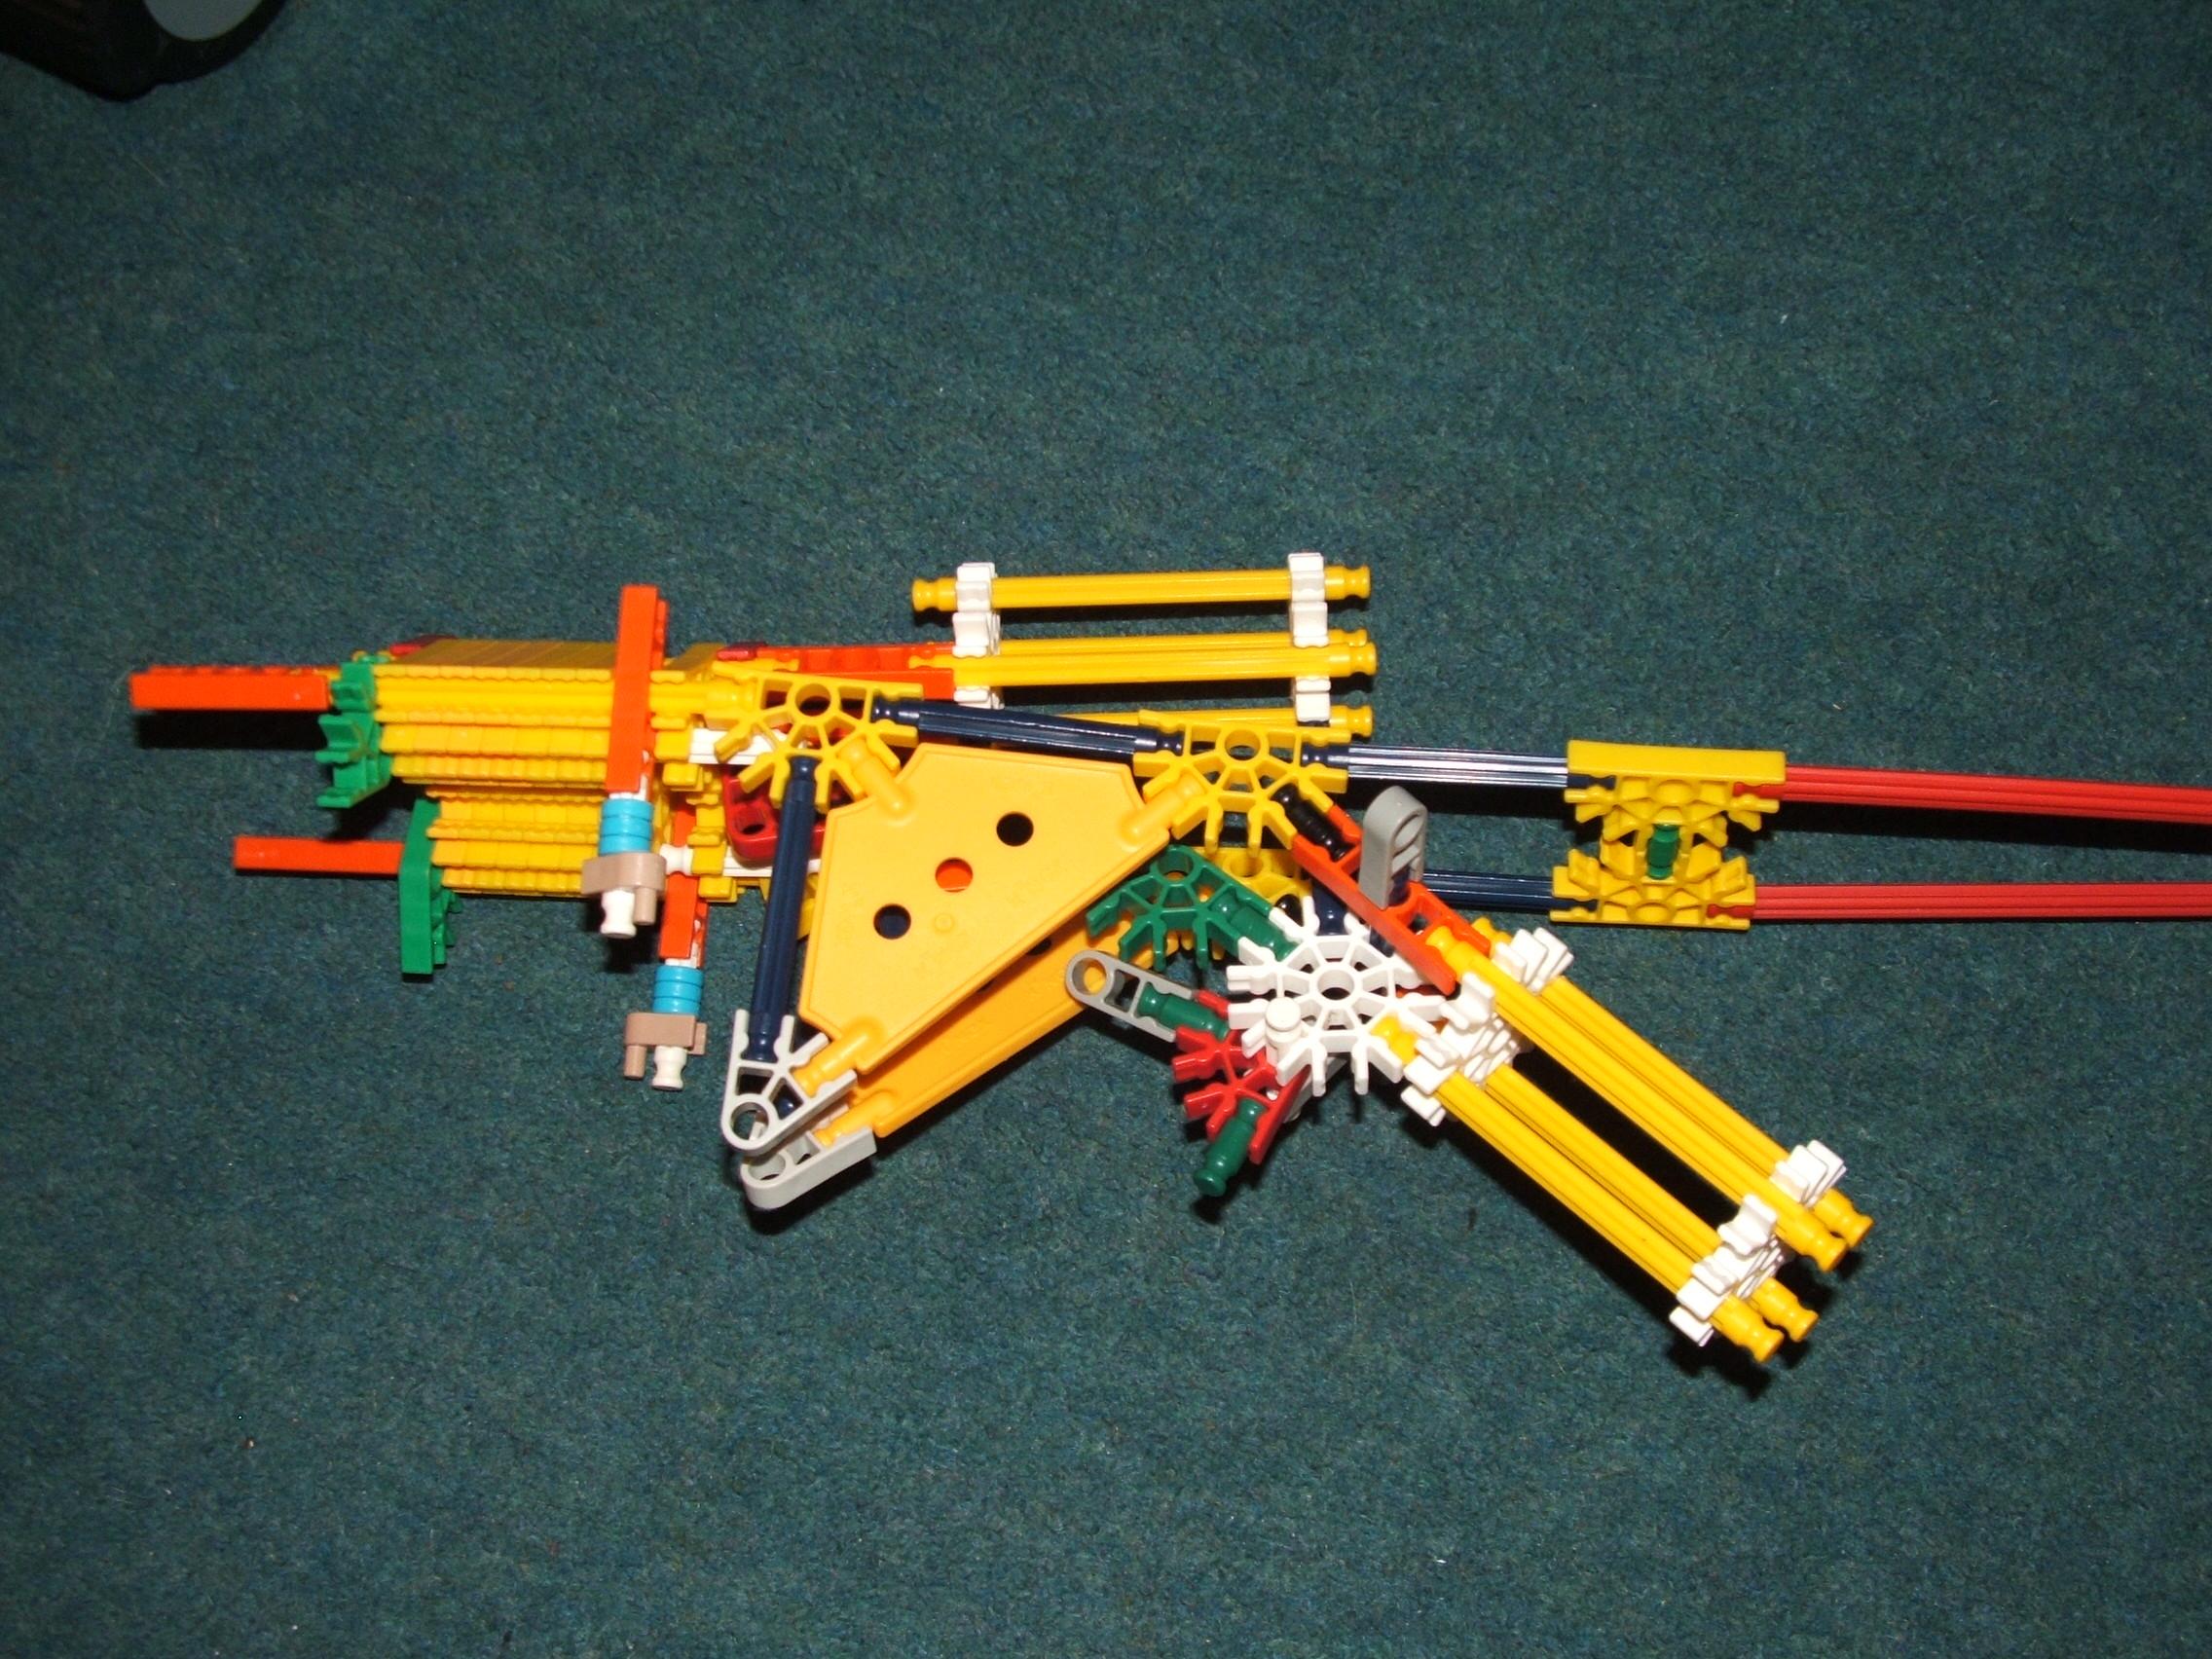 Dual firing, Knex sniper, true trigger with scope.